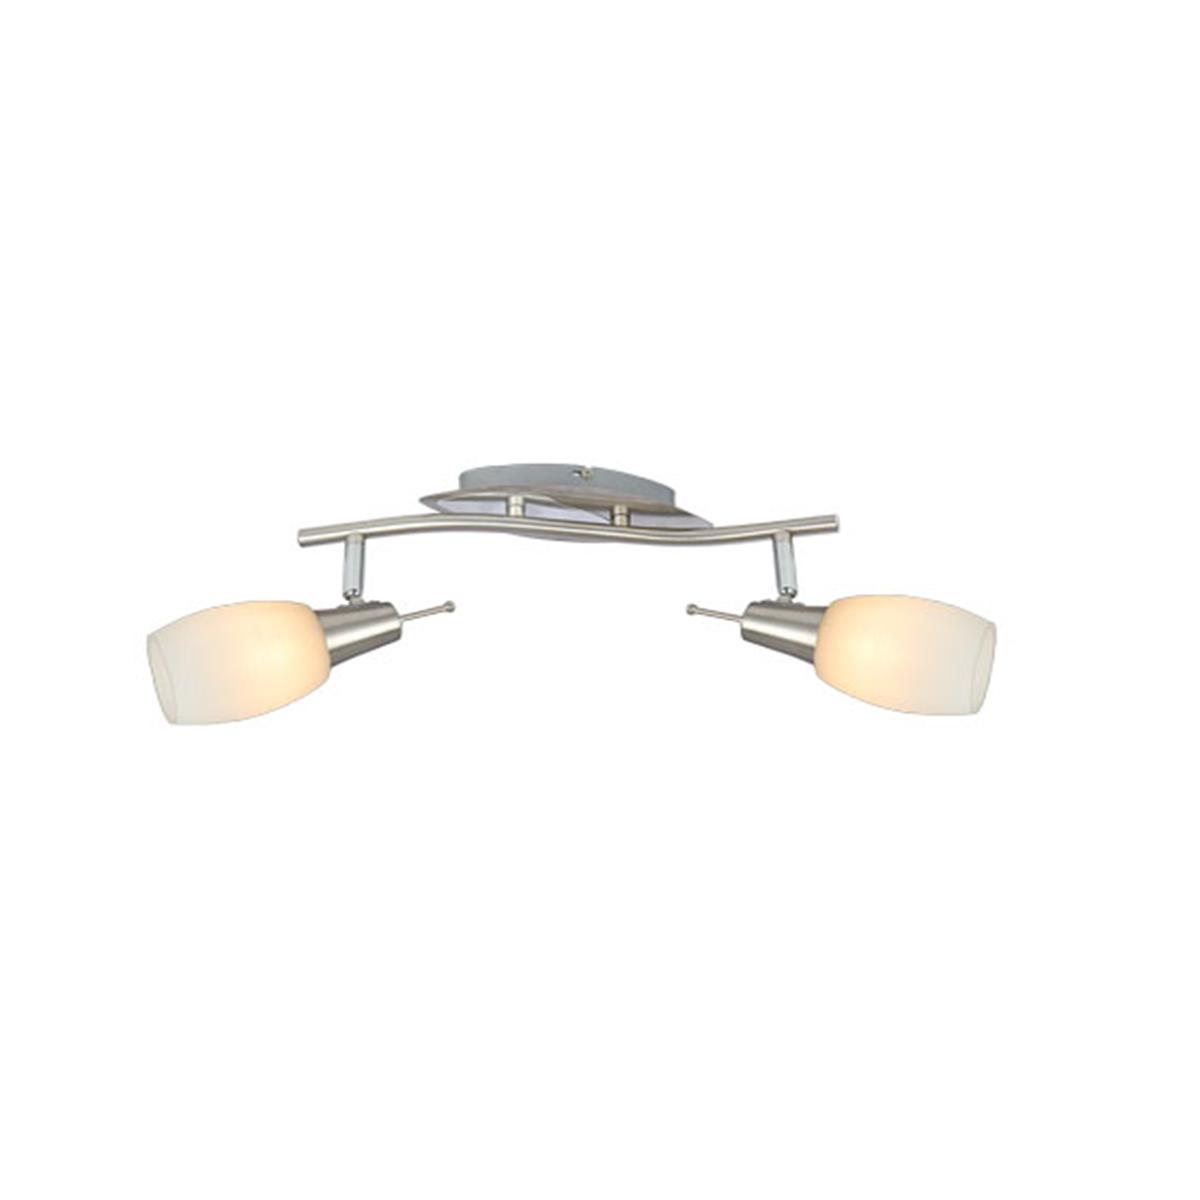 Spot lampa Polaris/2  6600966